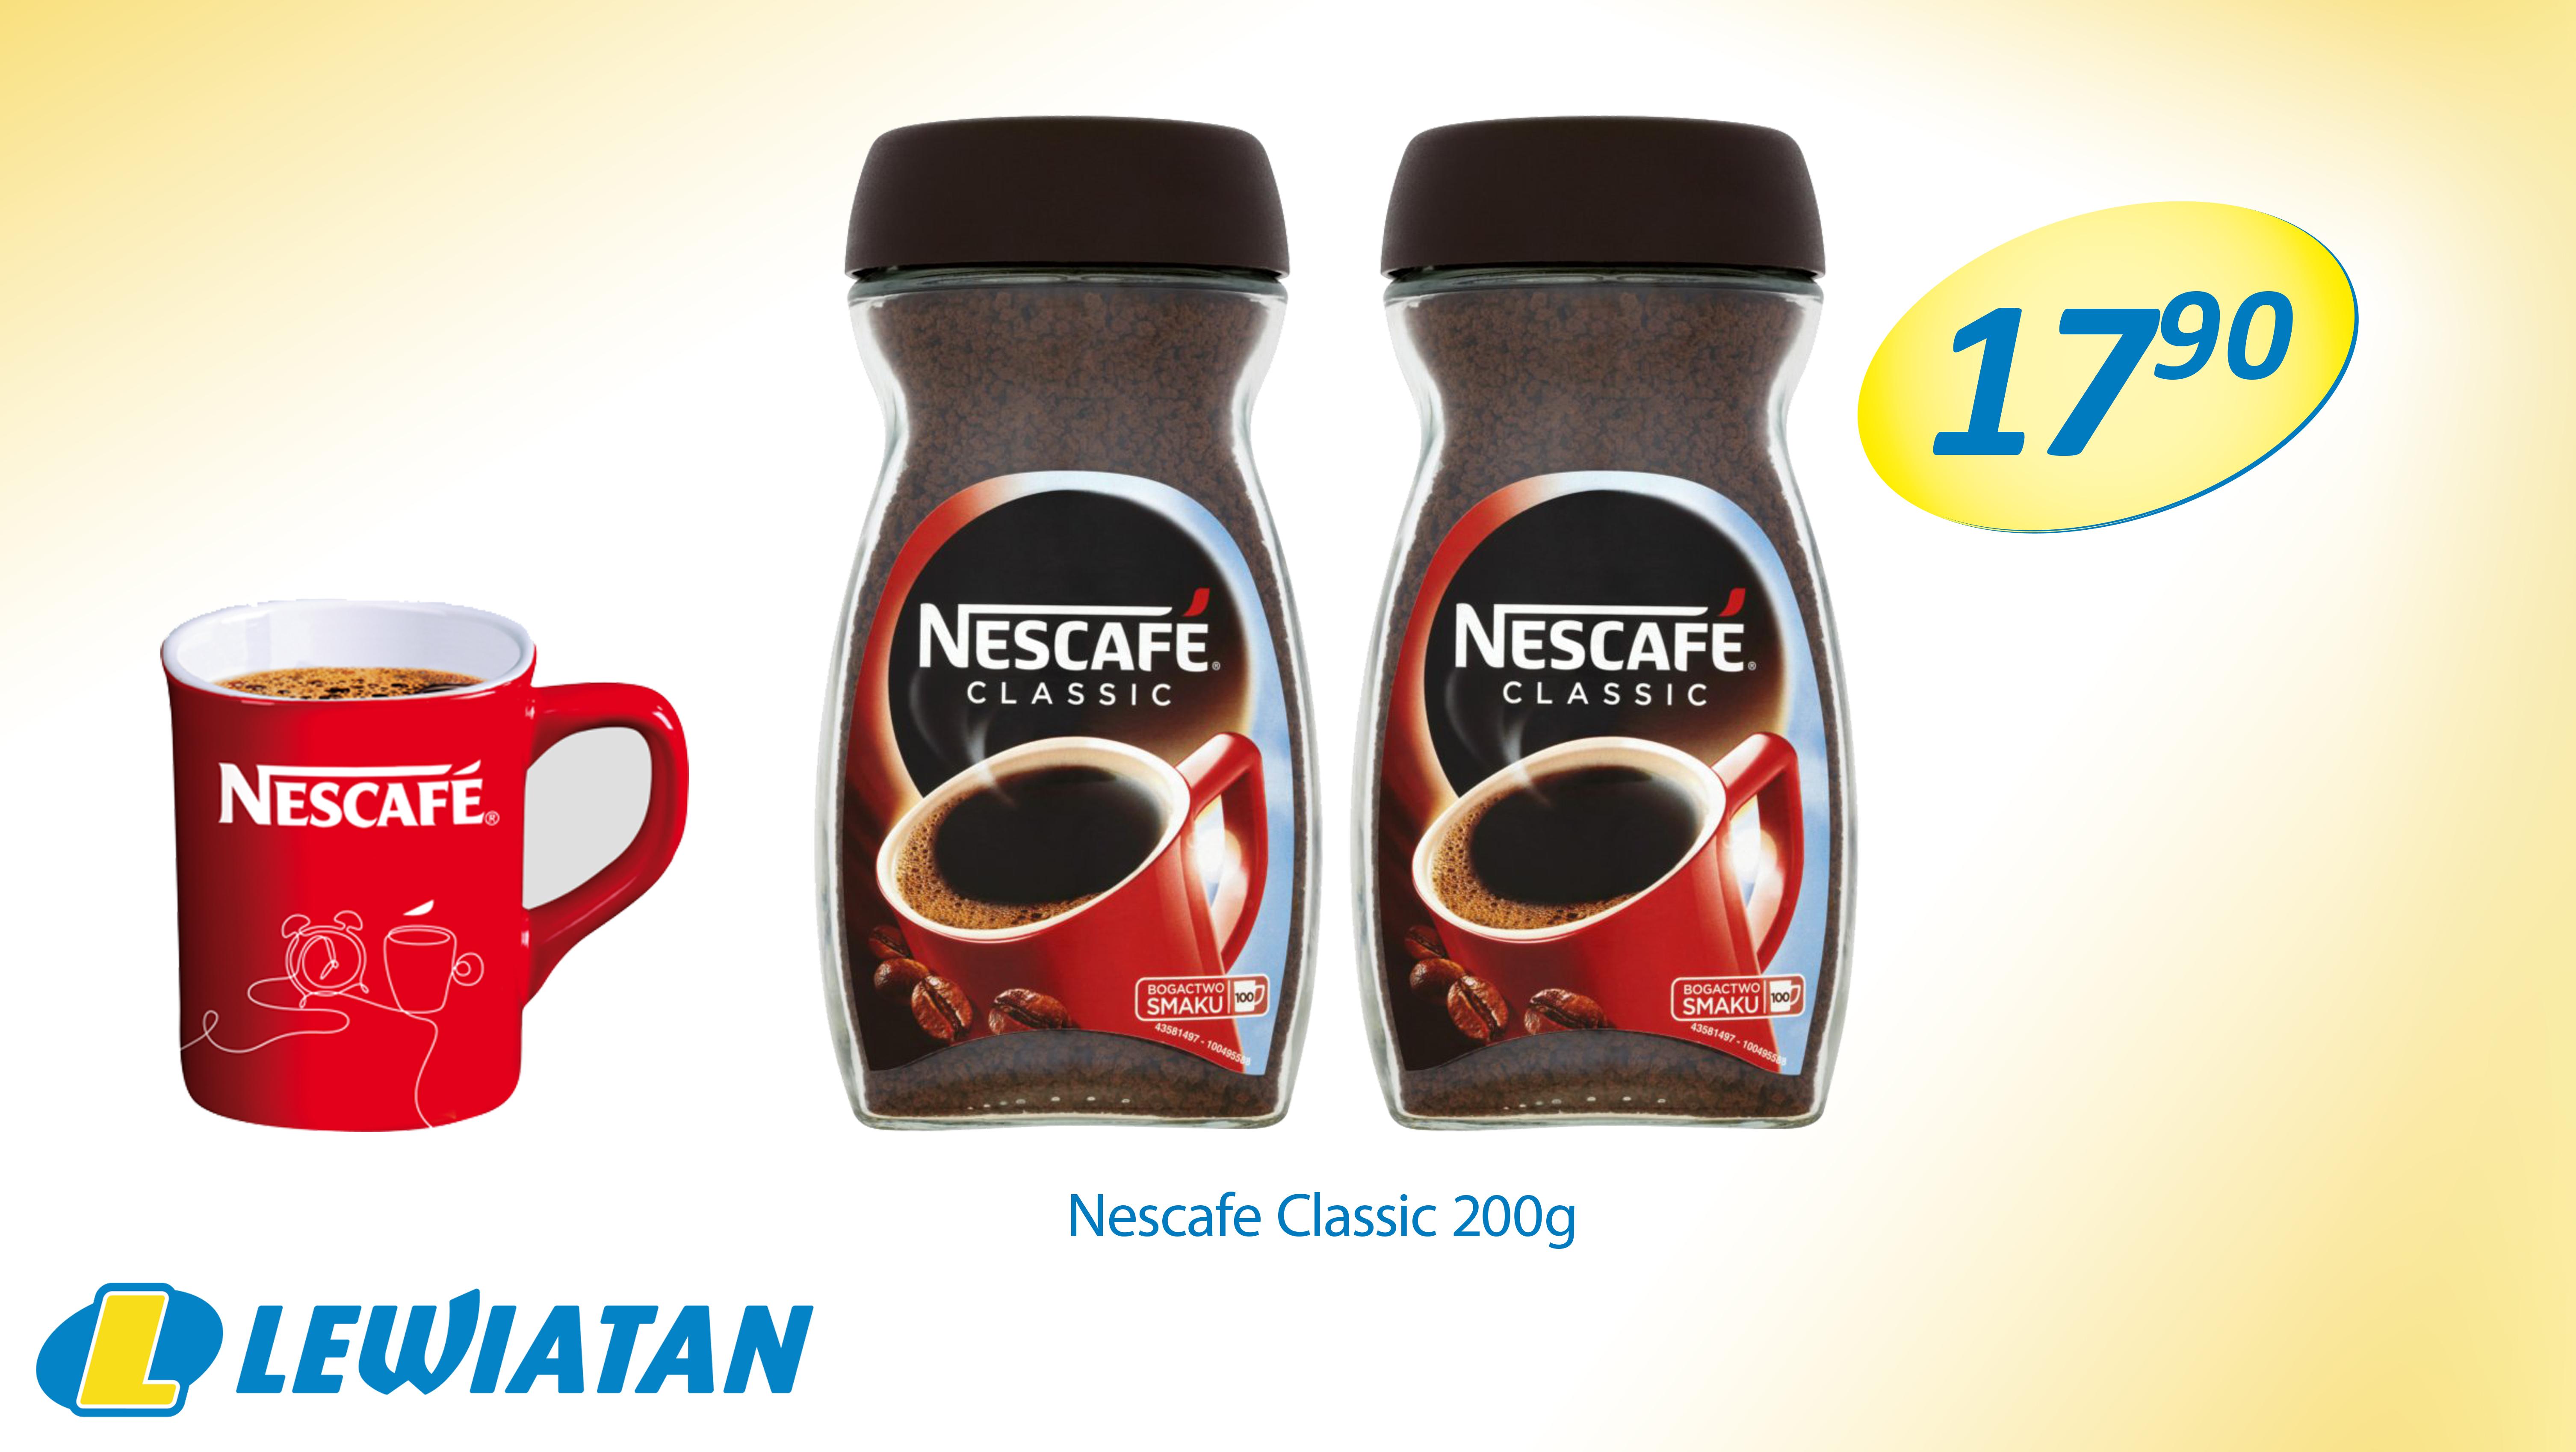 nescafe-classic-200g-1790